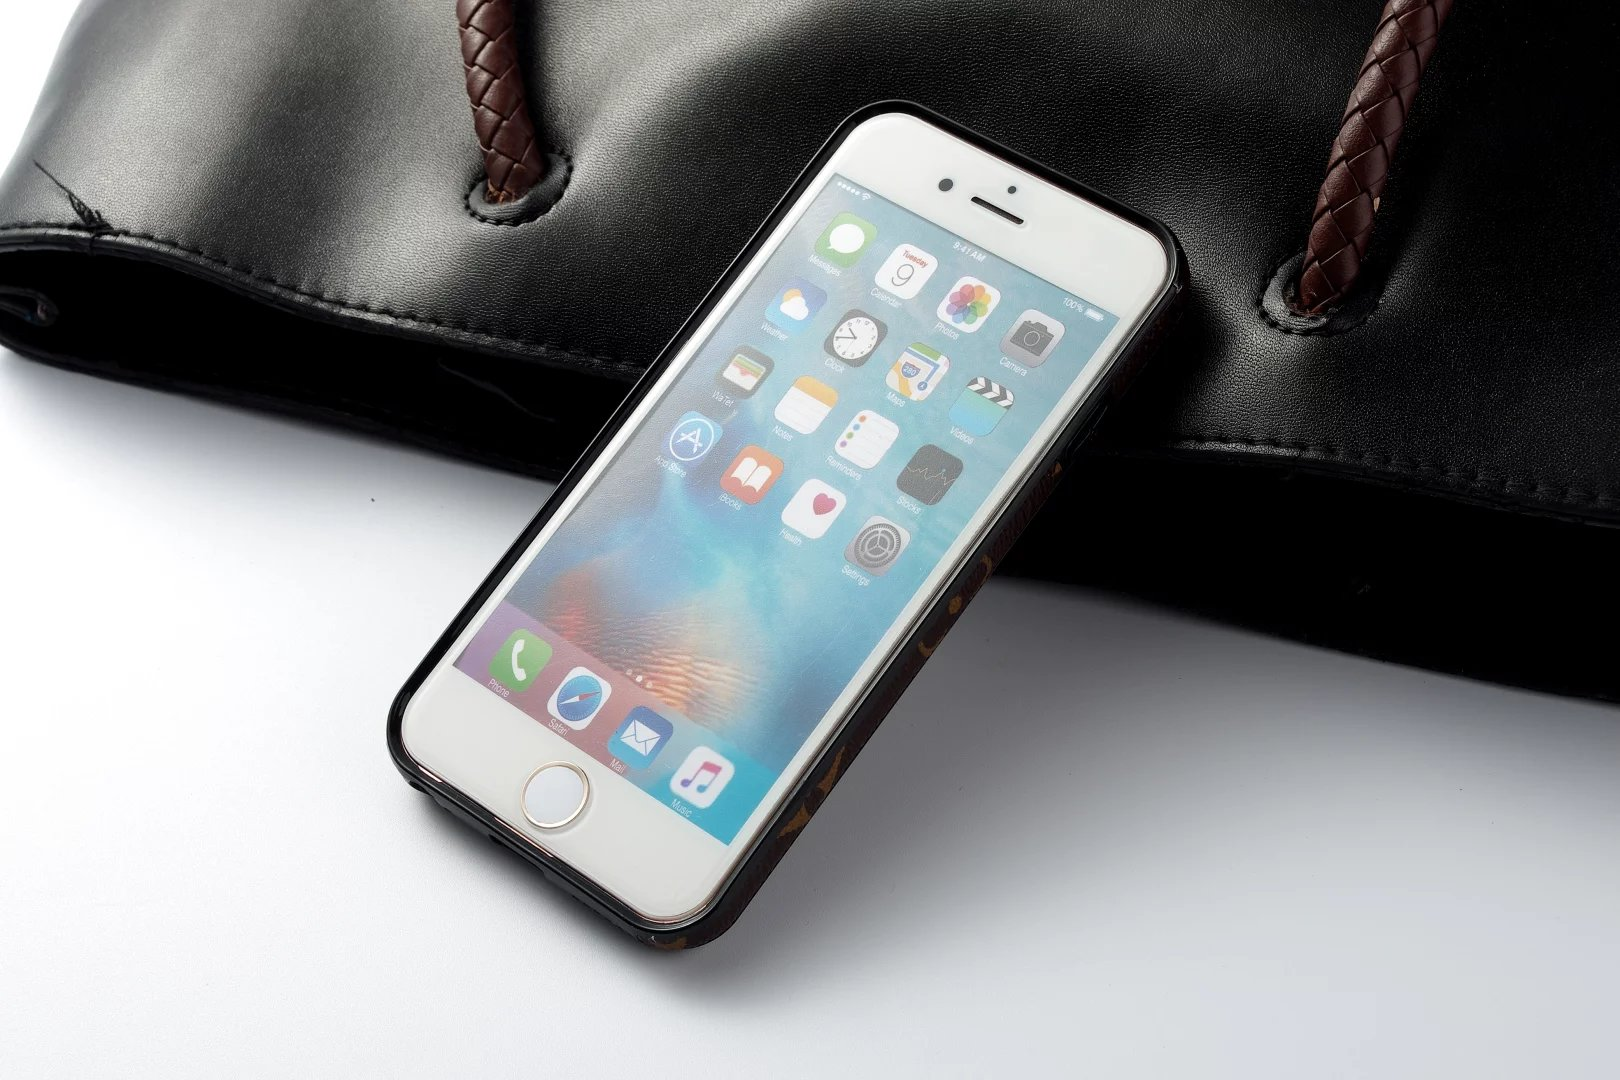 schöne iphone hüllen iphone hülle foto Louis Vuitton iphone6s plus hülle schutzhülle iphone bumper iphone 6s Plus ilikon iphone schutz gussform samsung galaxy s3 handyhülle 6slbst gestalten iphone 6s Plus hülle portemonnaie